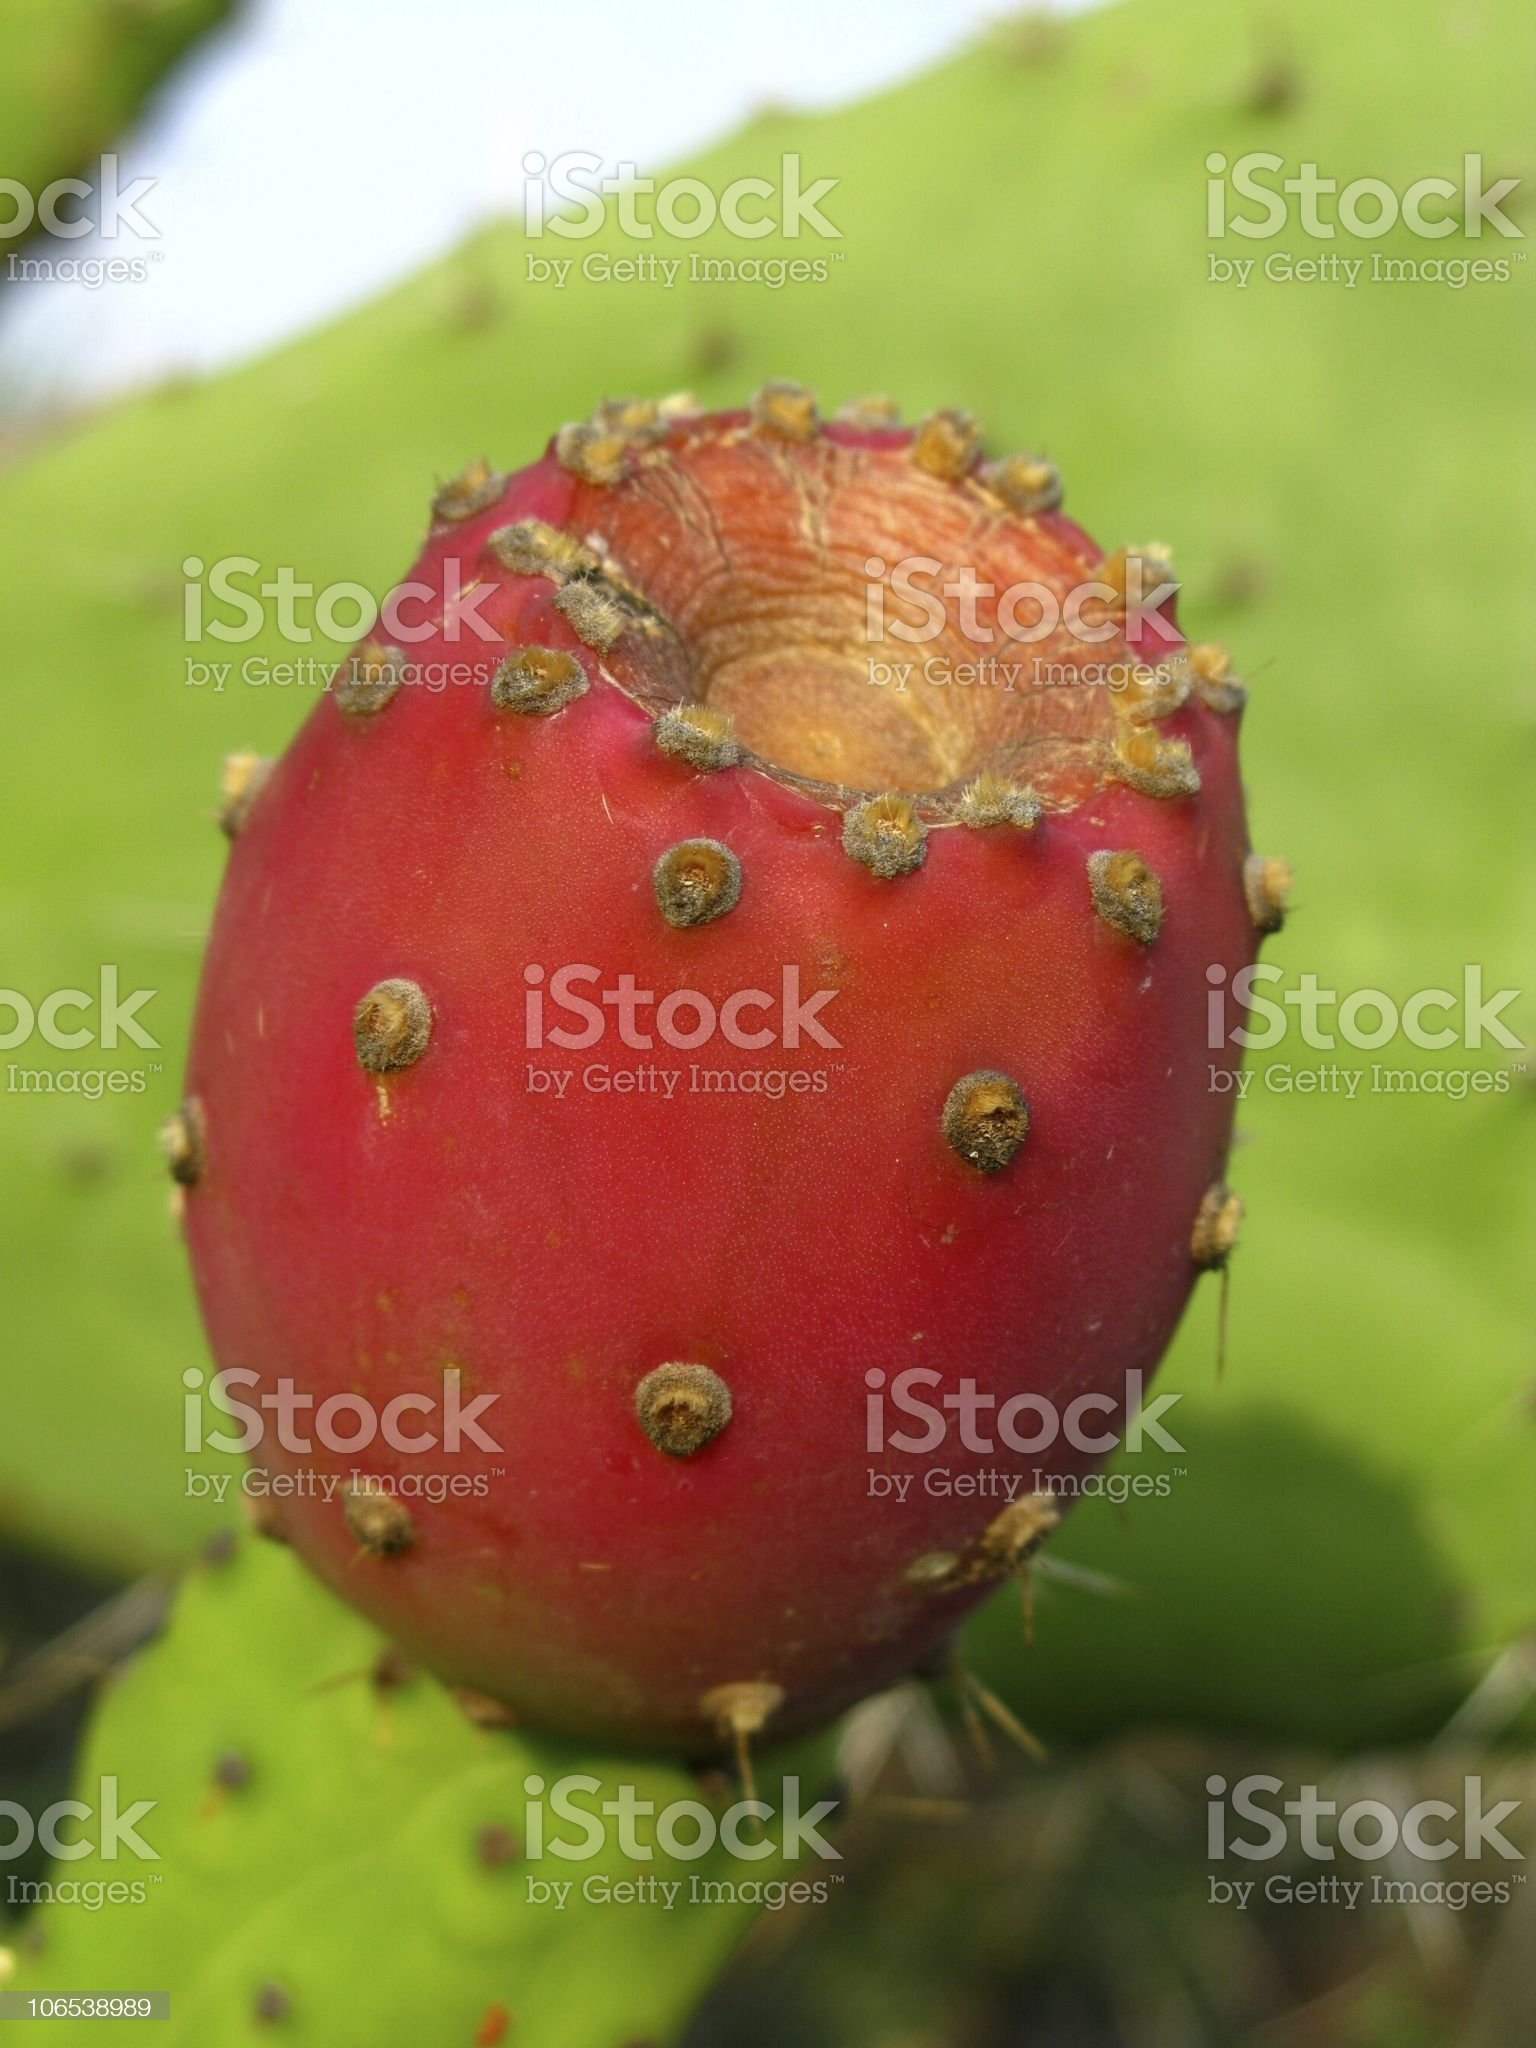 Kaktusfeige royalty-free stock photo